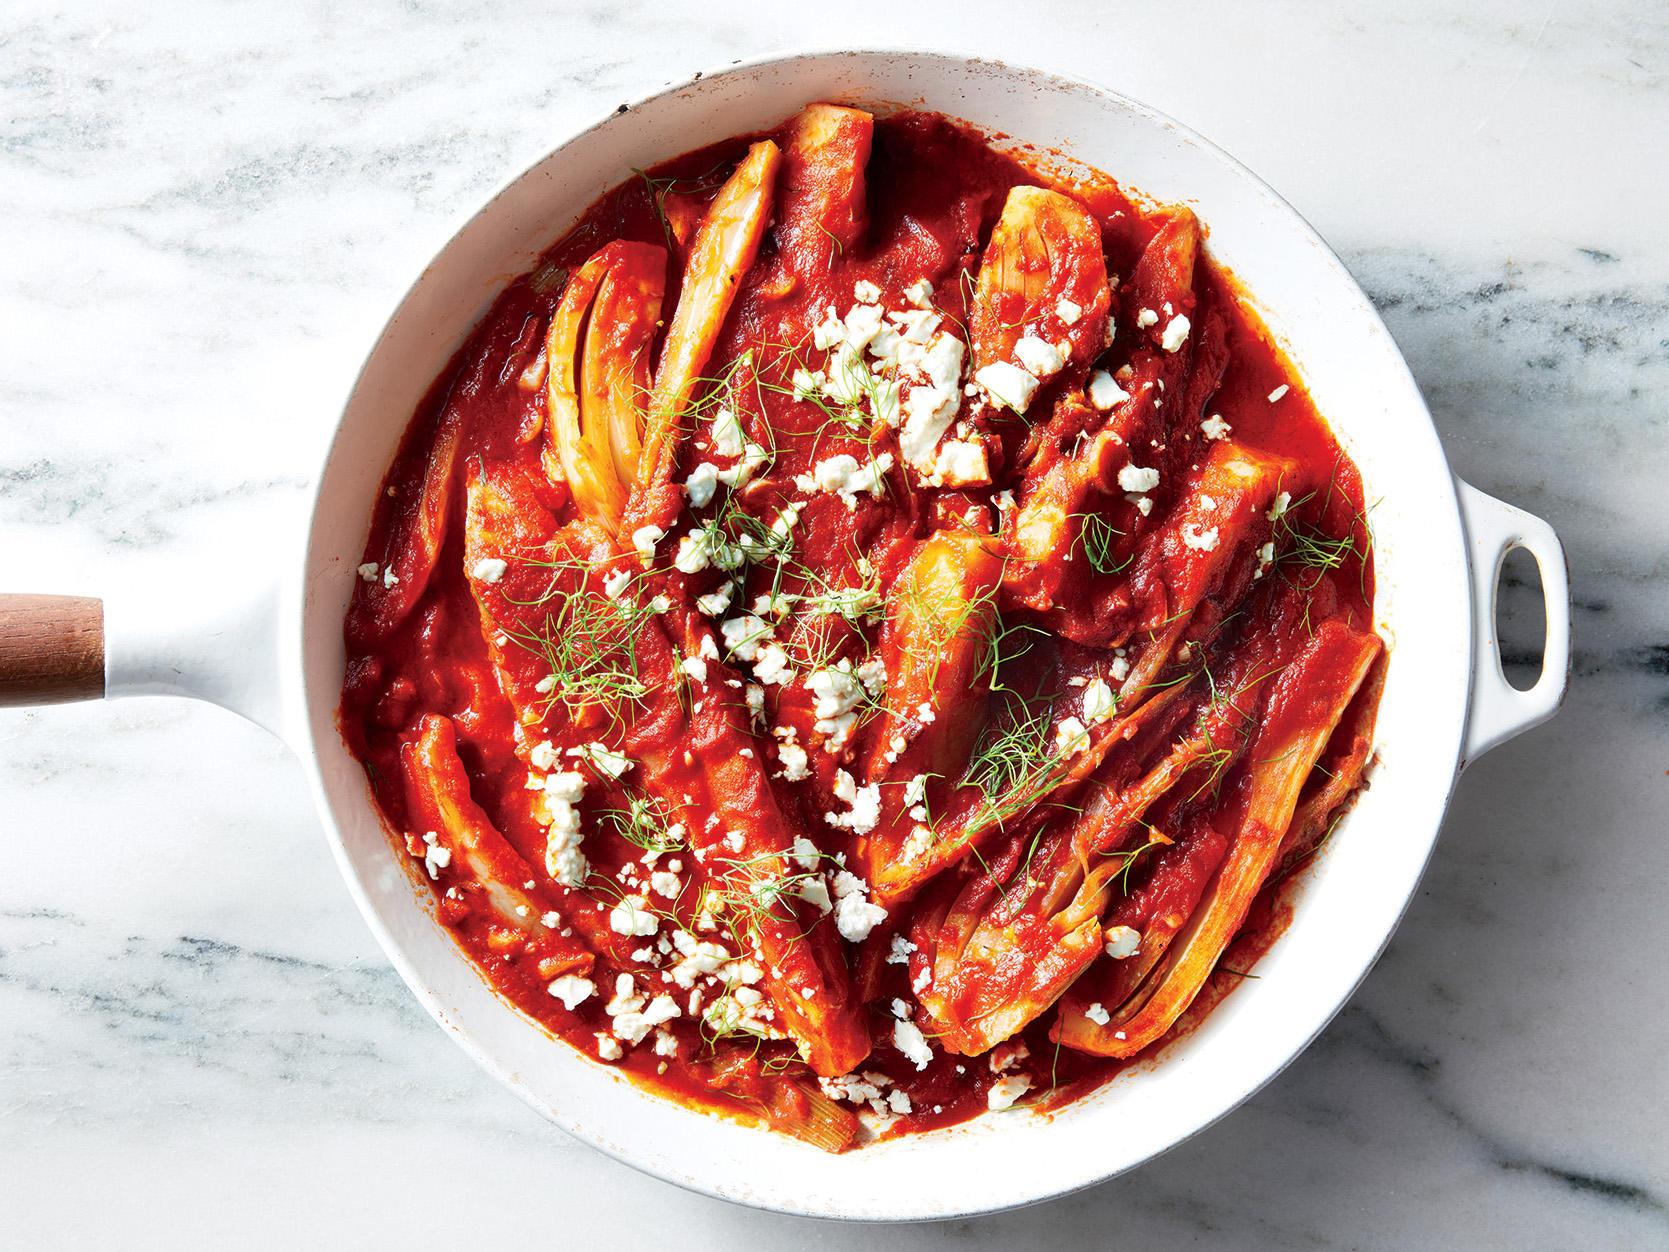 Fennel, Tomato, and Feta Skillet Bake